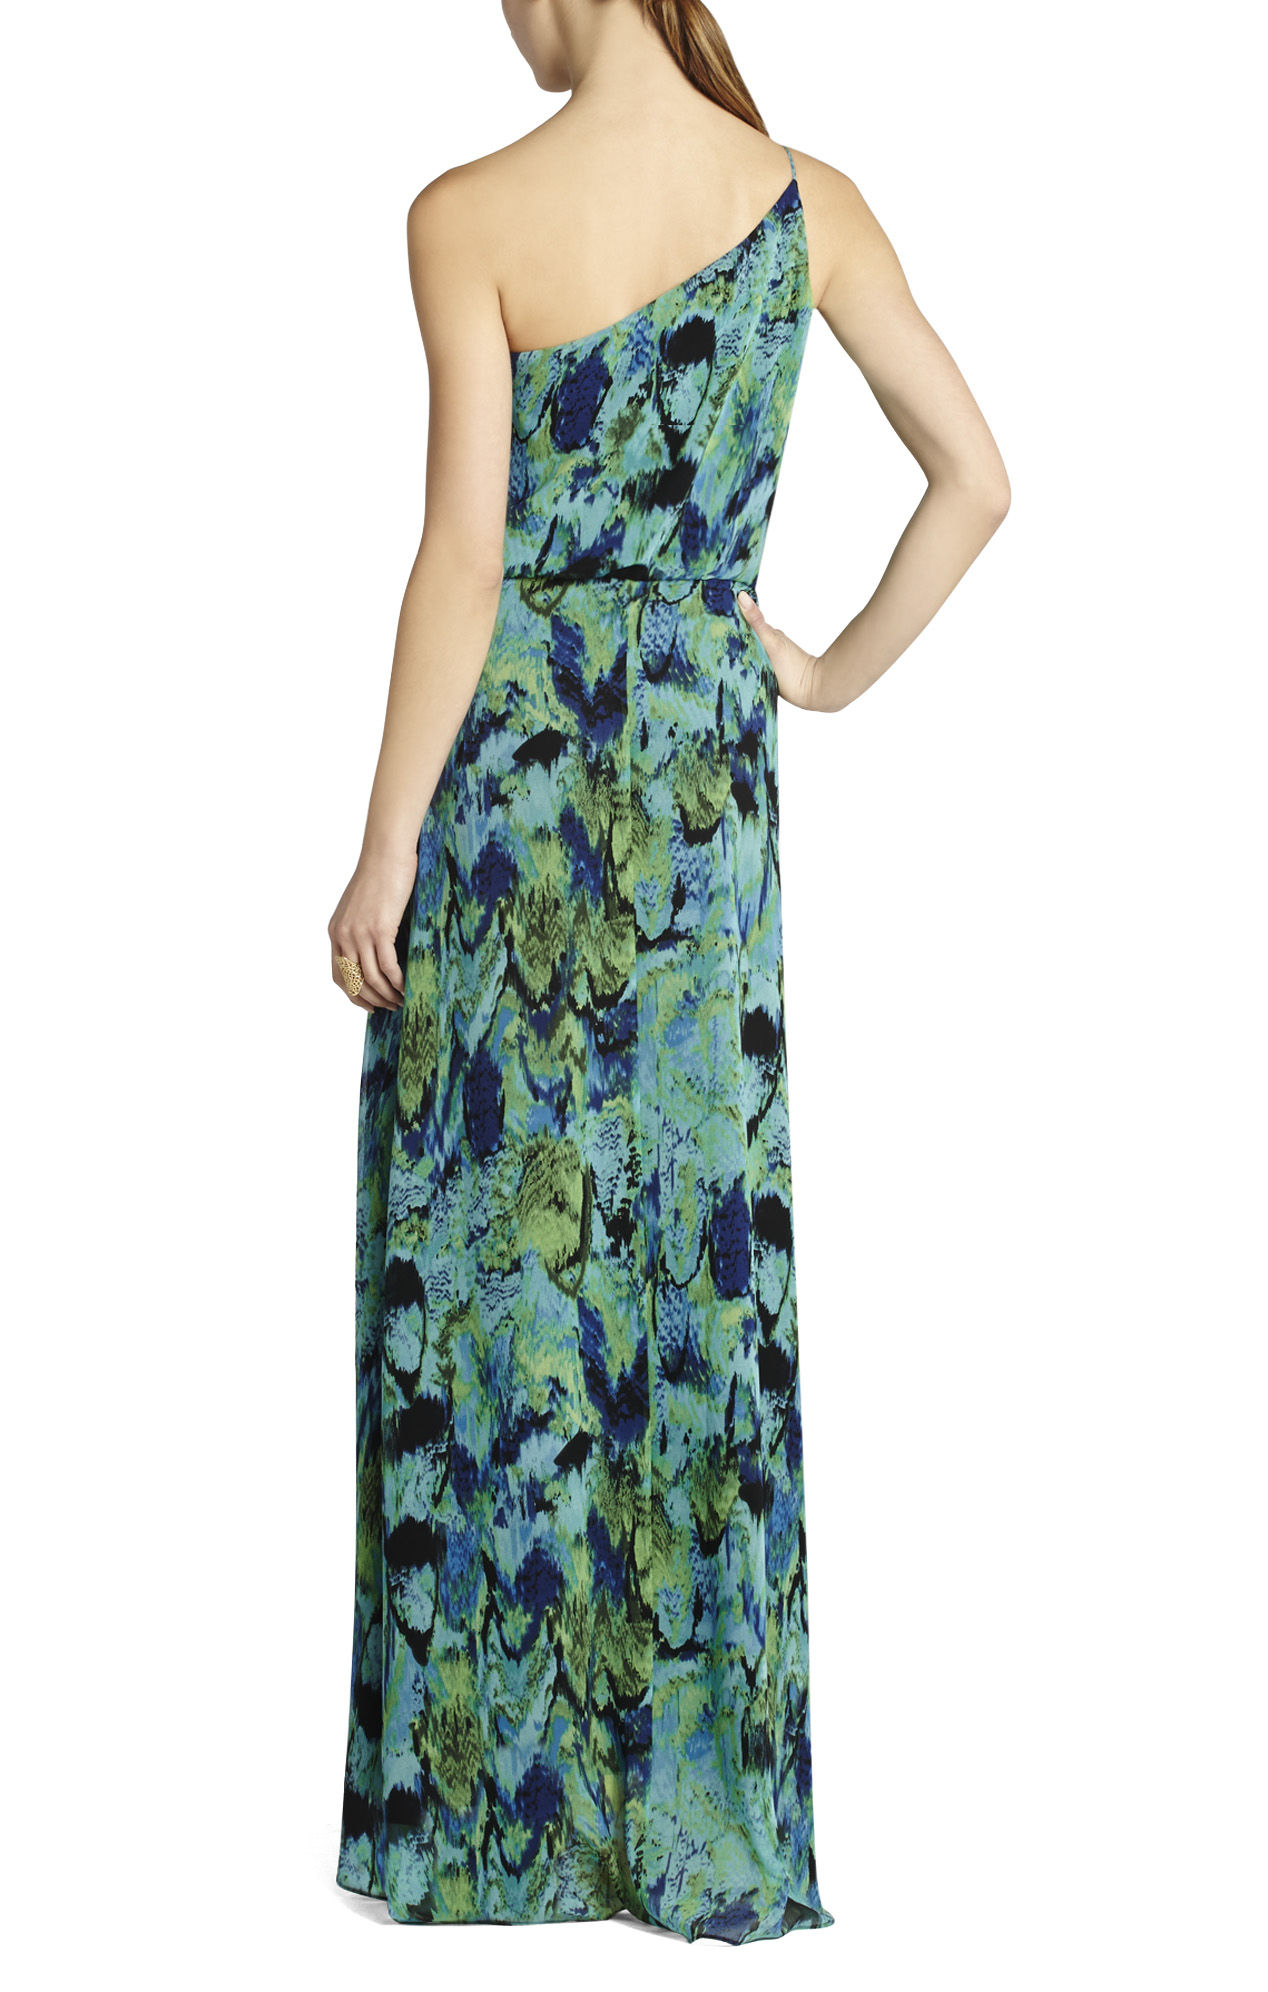 BCBG MaxAzria Nalda One-Shoulder Long Ruffle Dress_01